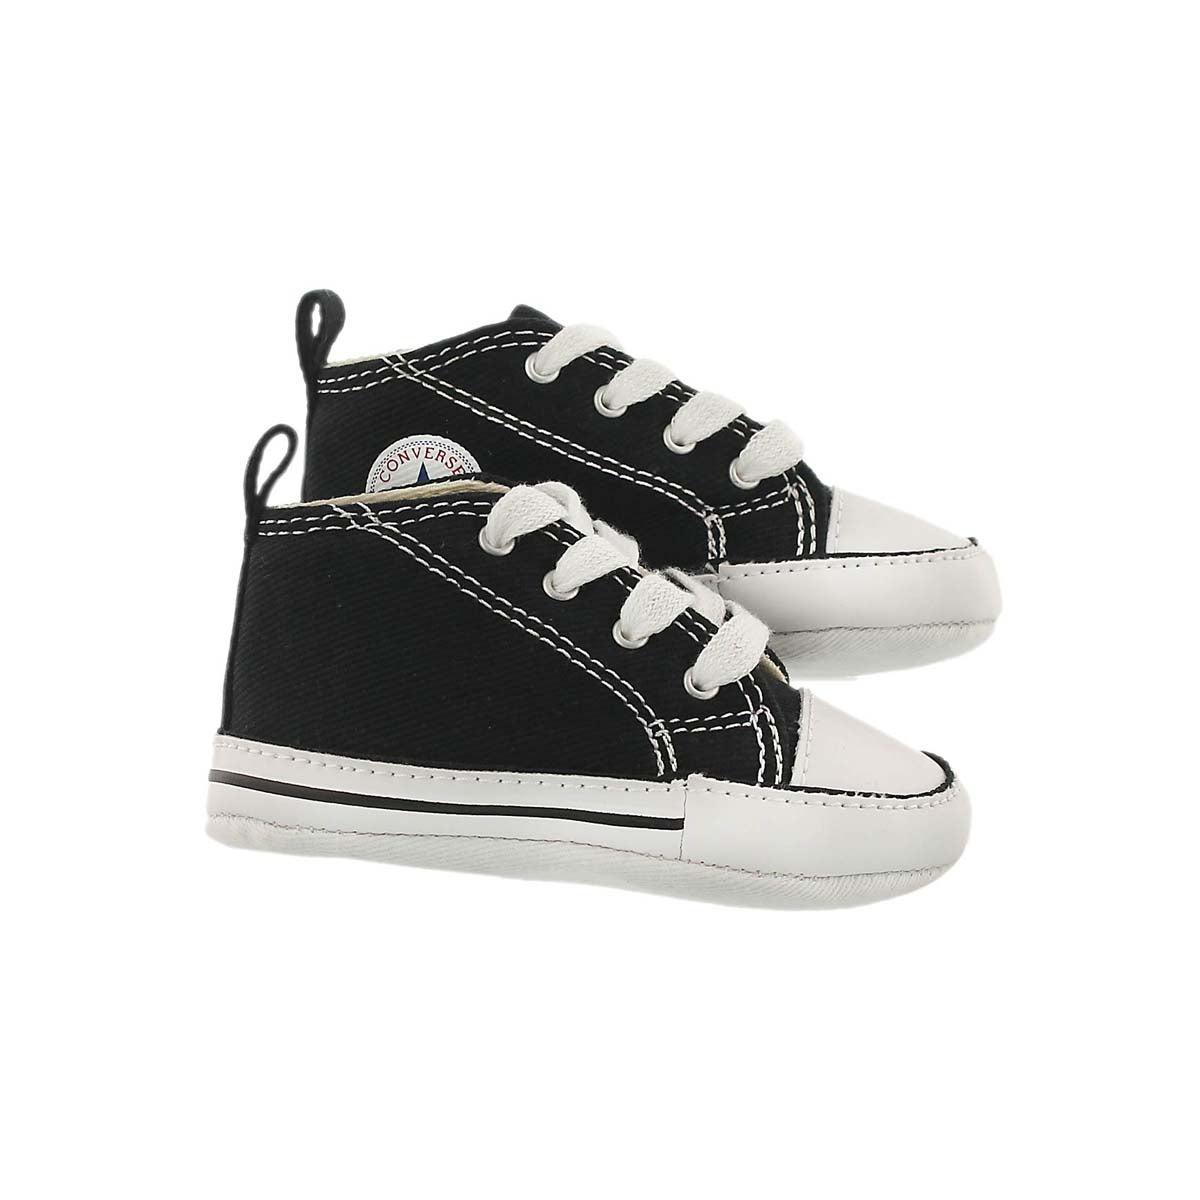 Infs CTAS Crib black canvas sneaker